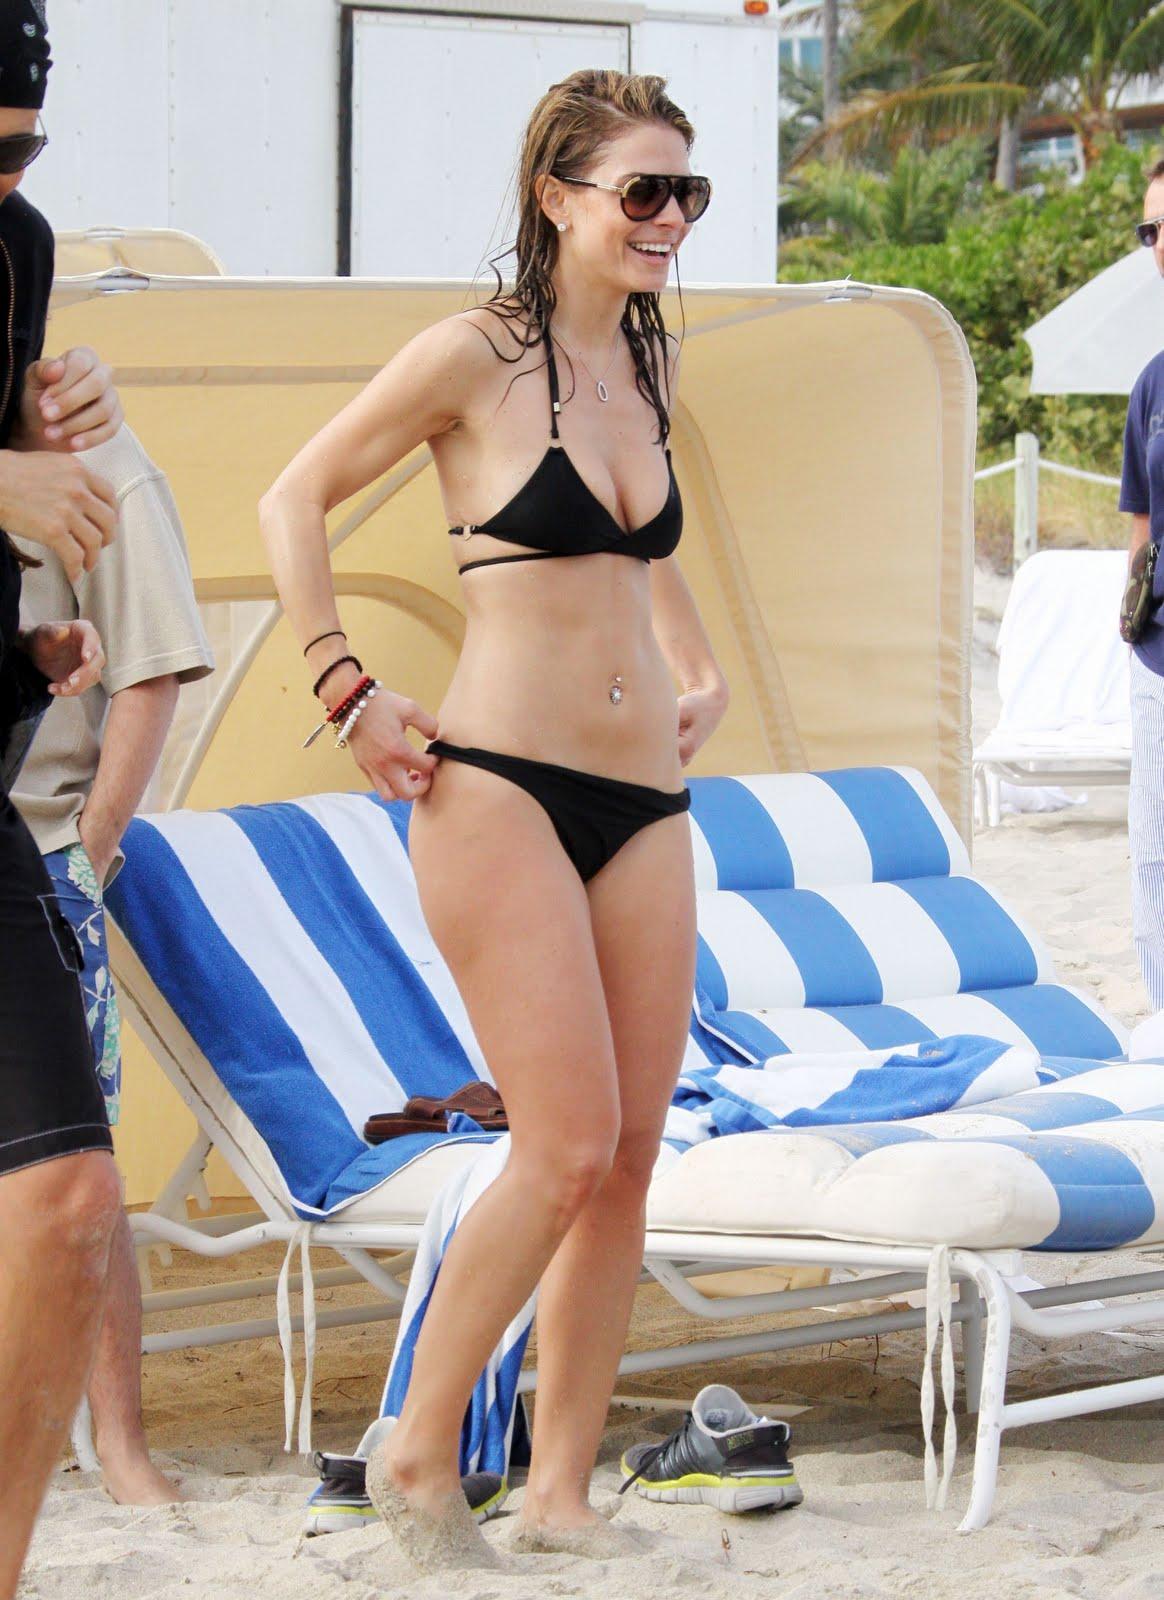 Maria menounos bikini pussy slip perhaps shall